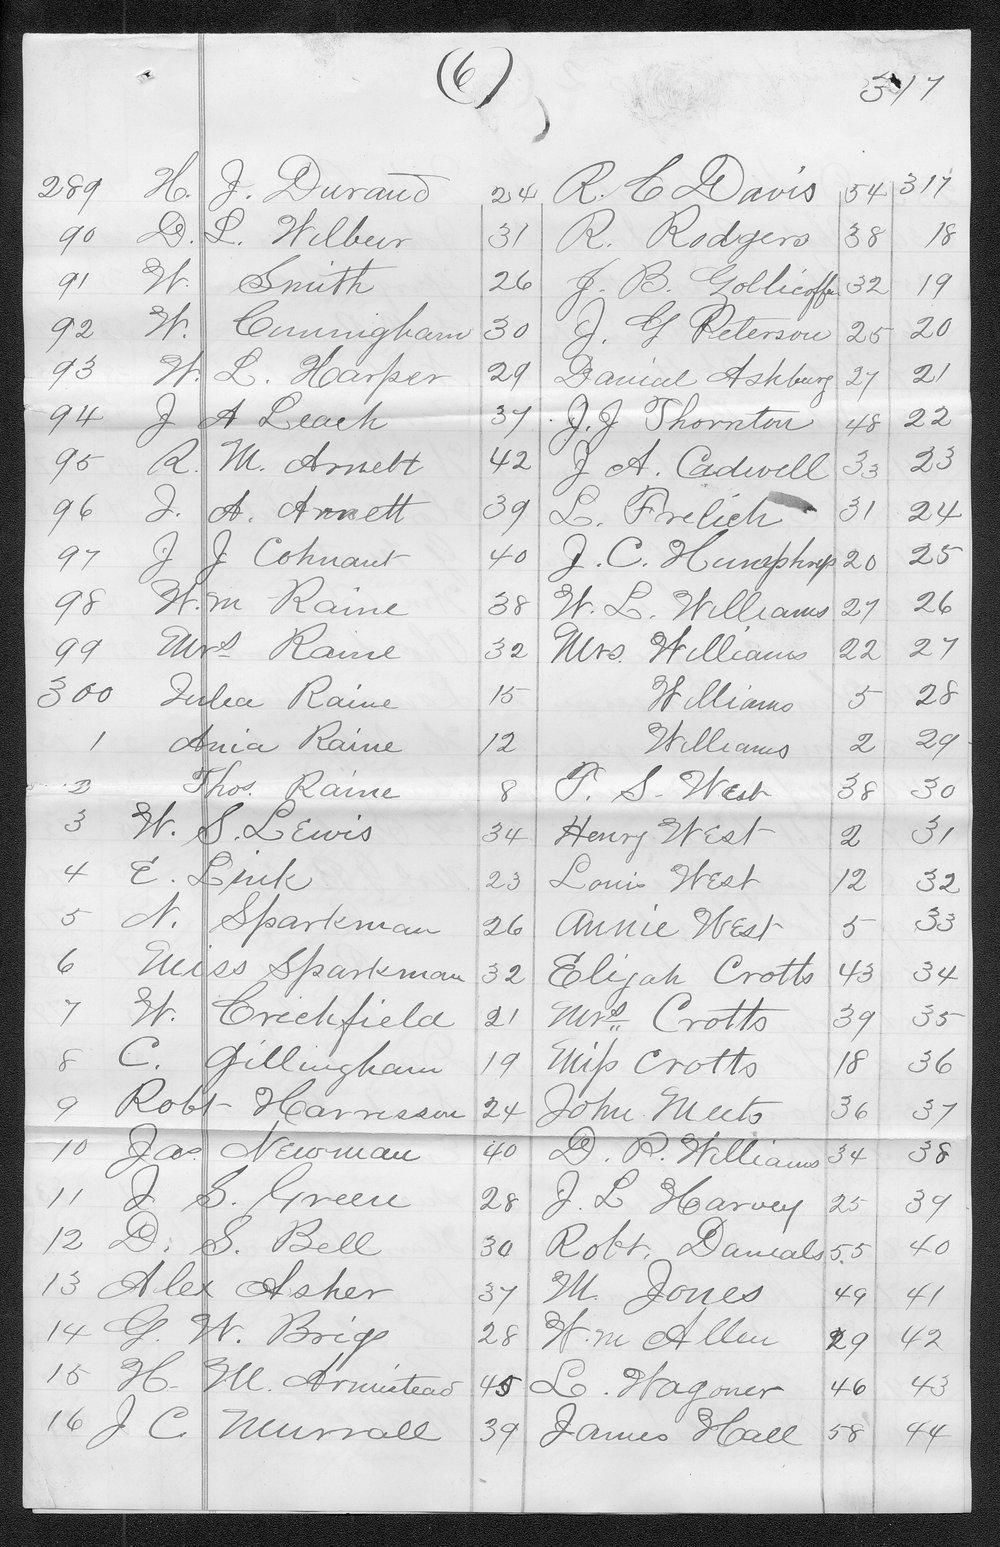 Barber county organization records - 11